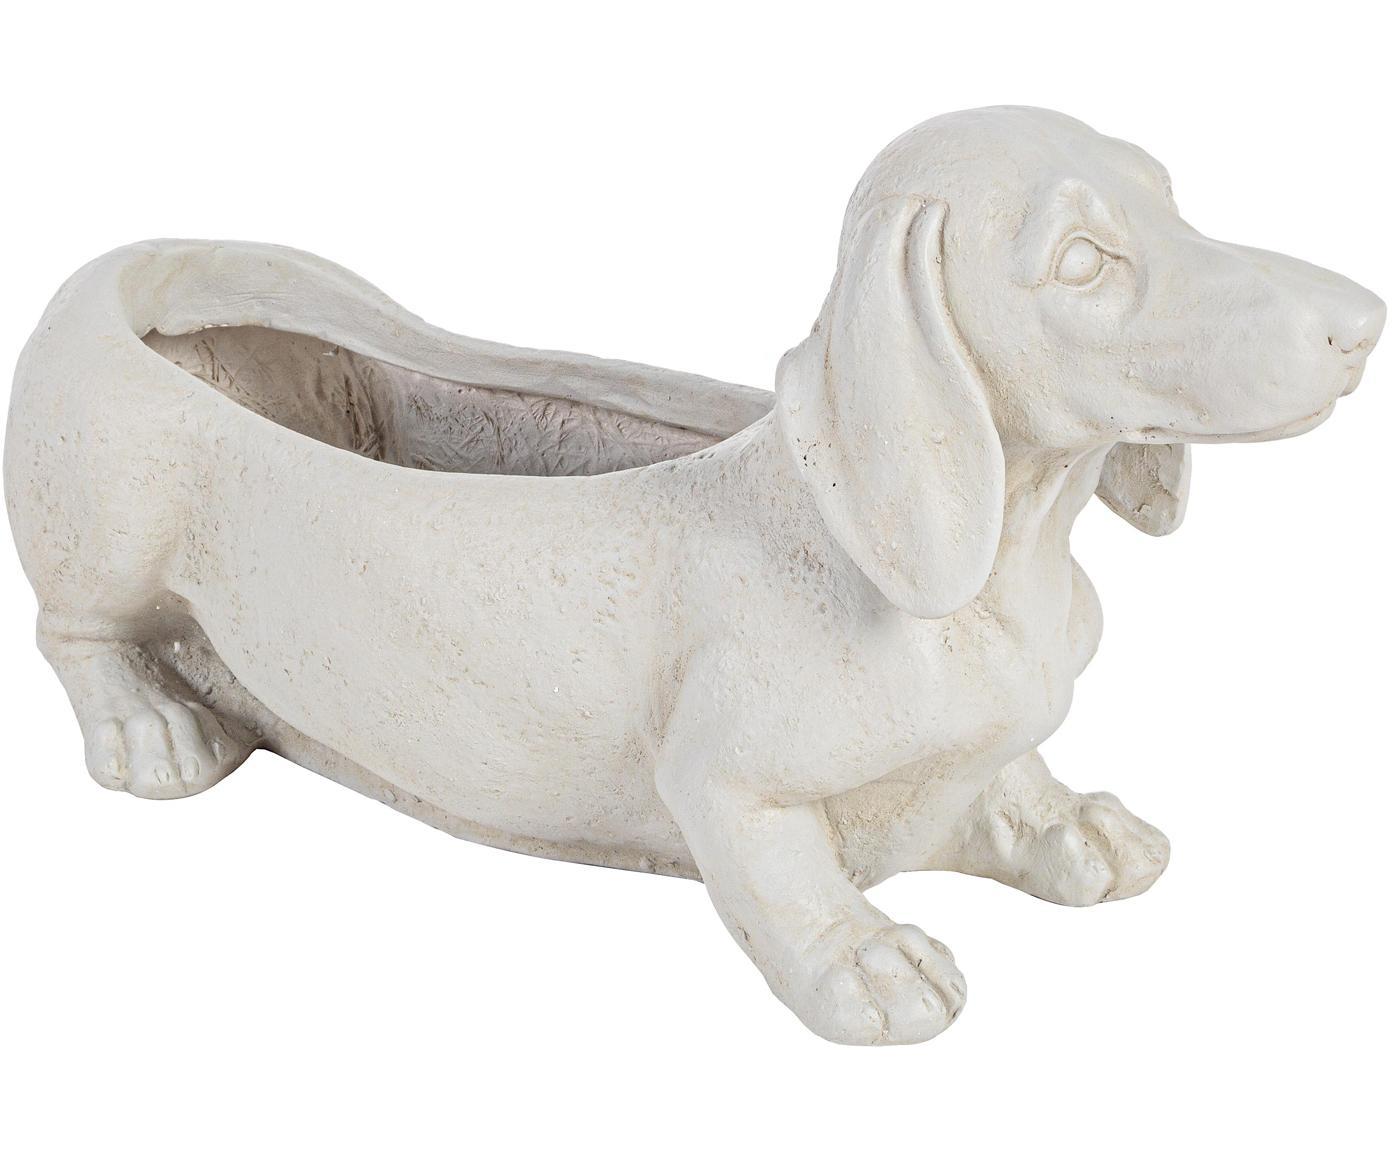 Portavaso Dog, Cemento, rivestito, Bianco latteo, Larg. 50 x Alt. 27 cm